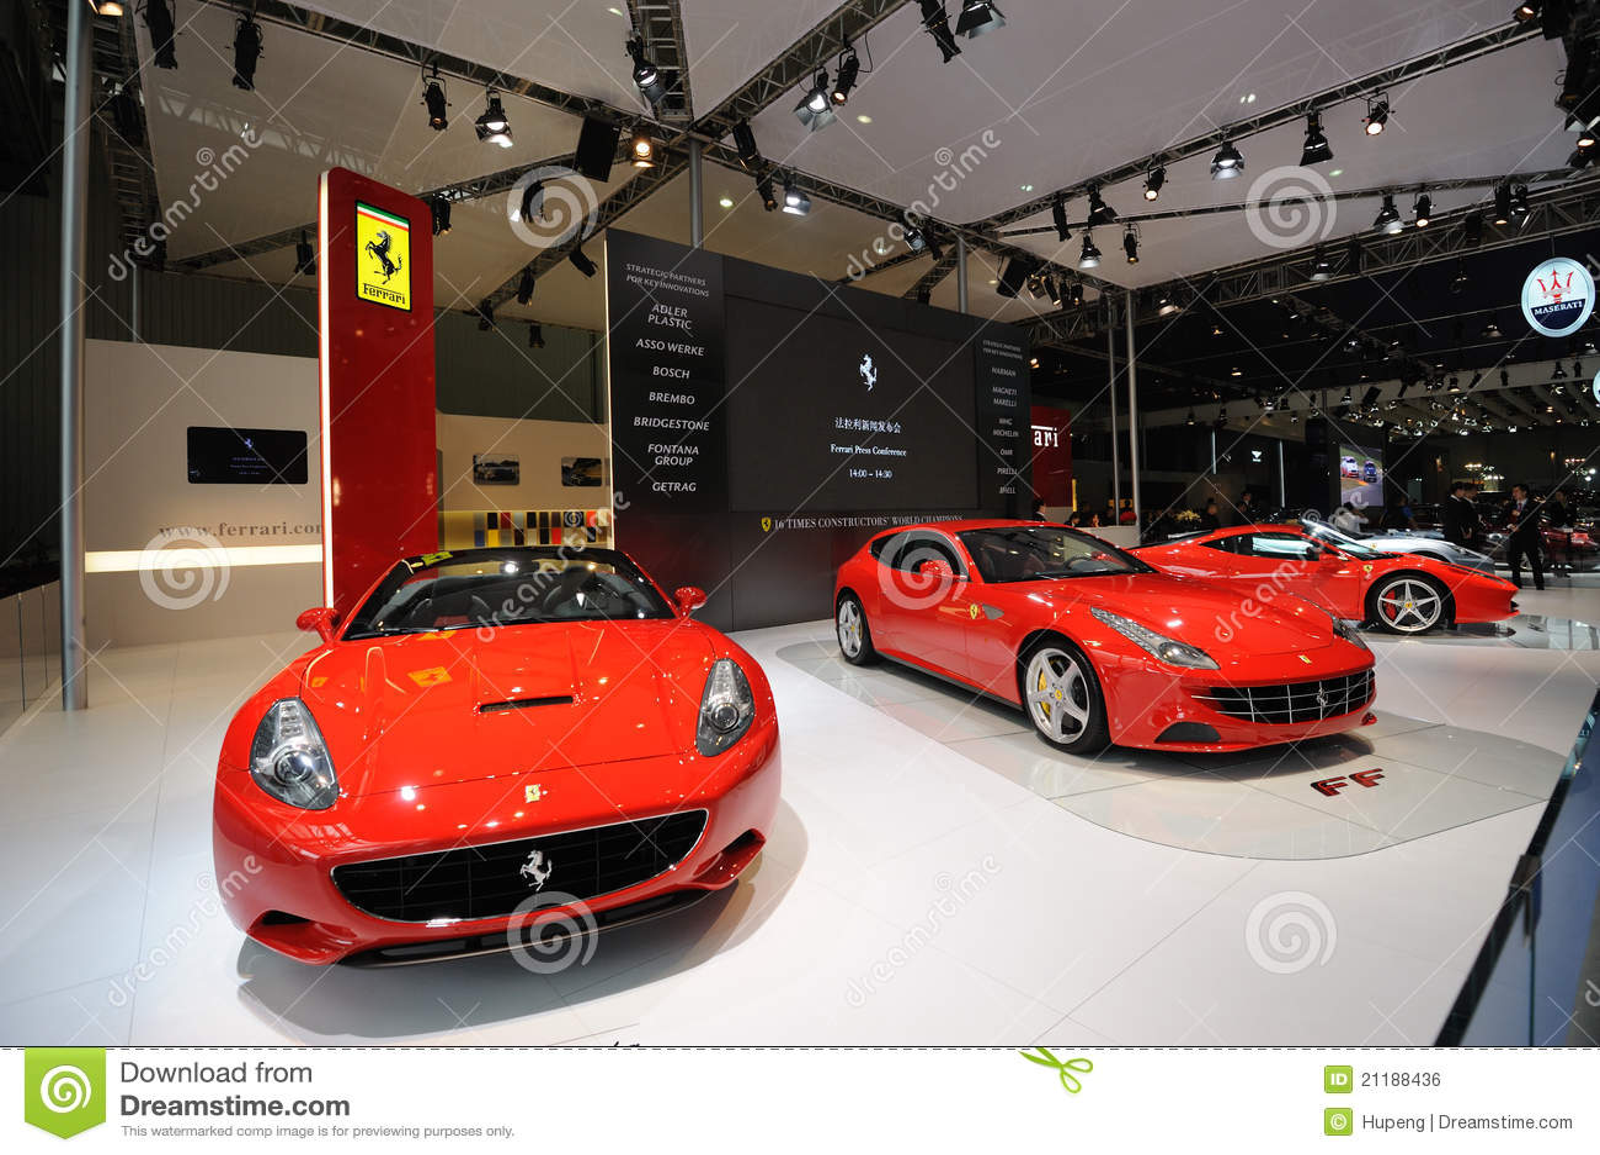 Ferrari pavilion